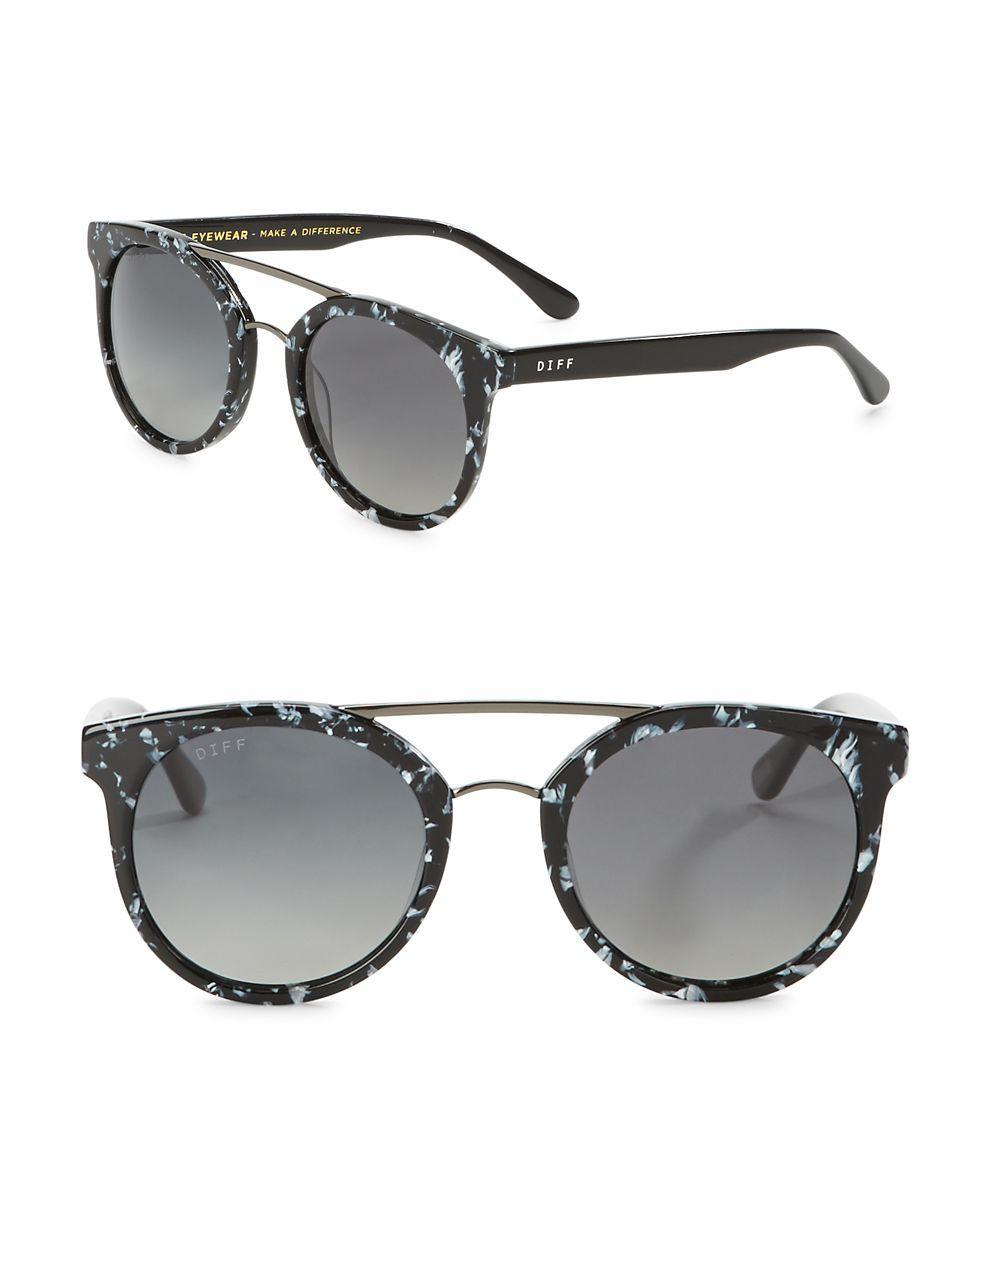 c6b95d3412 Lyst - Diff Eyewear Astro 51mm Polarized Round Sunglasses in Gray